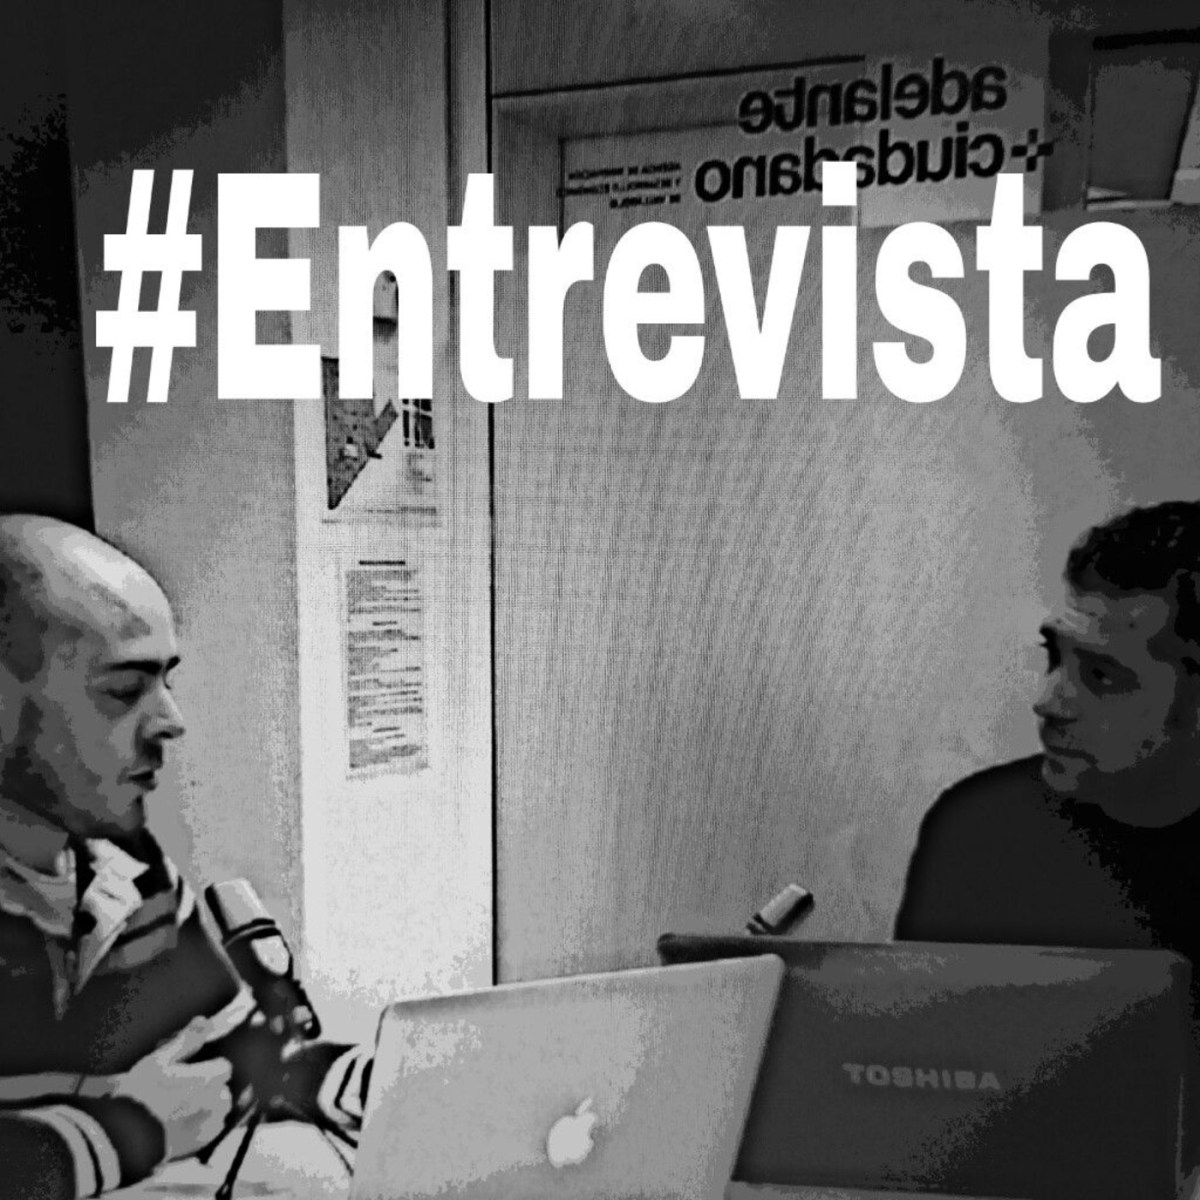 Episodio 1.14 Entrevista Startup Europe Week